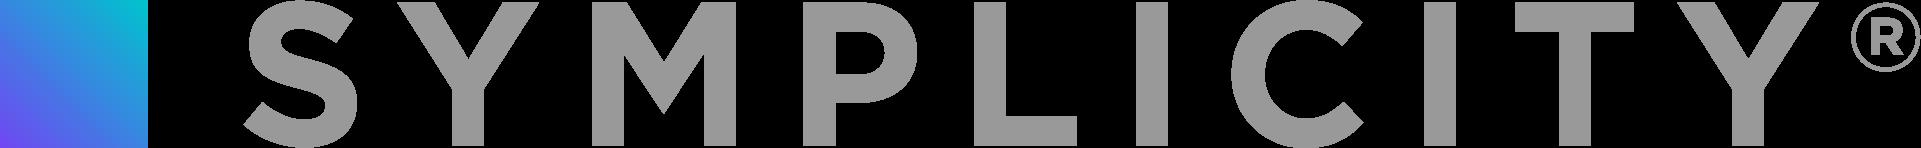 logo_digital_symplicity_reg_gradient-sq